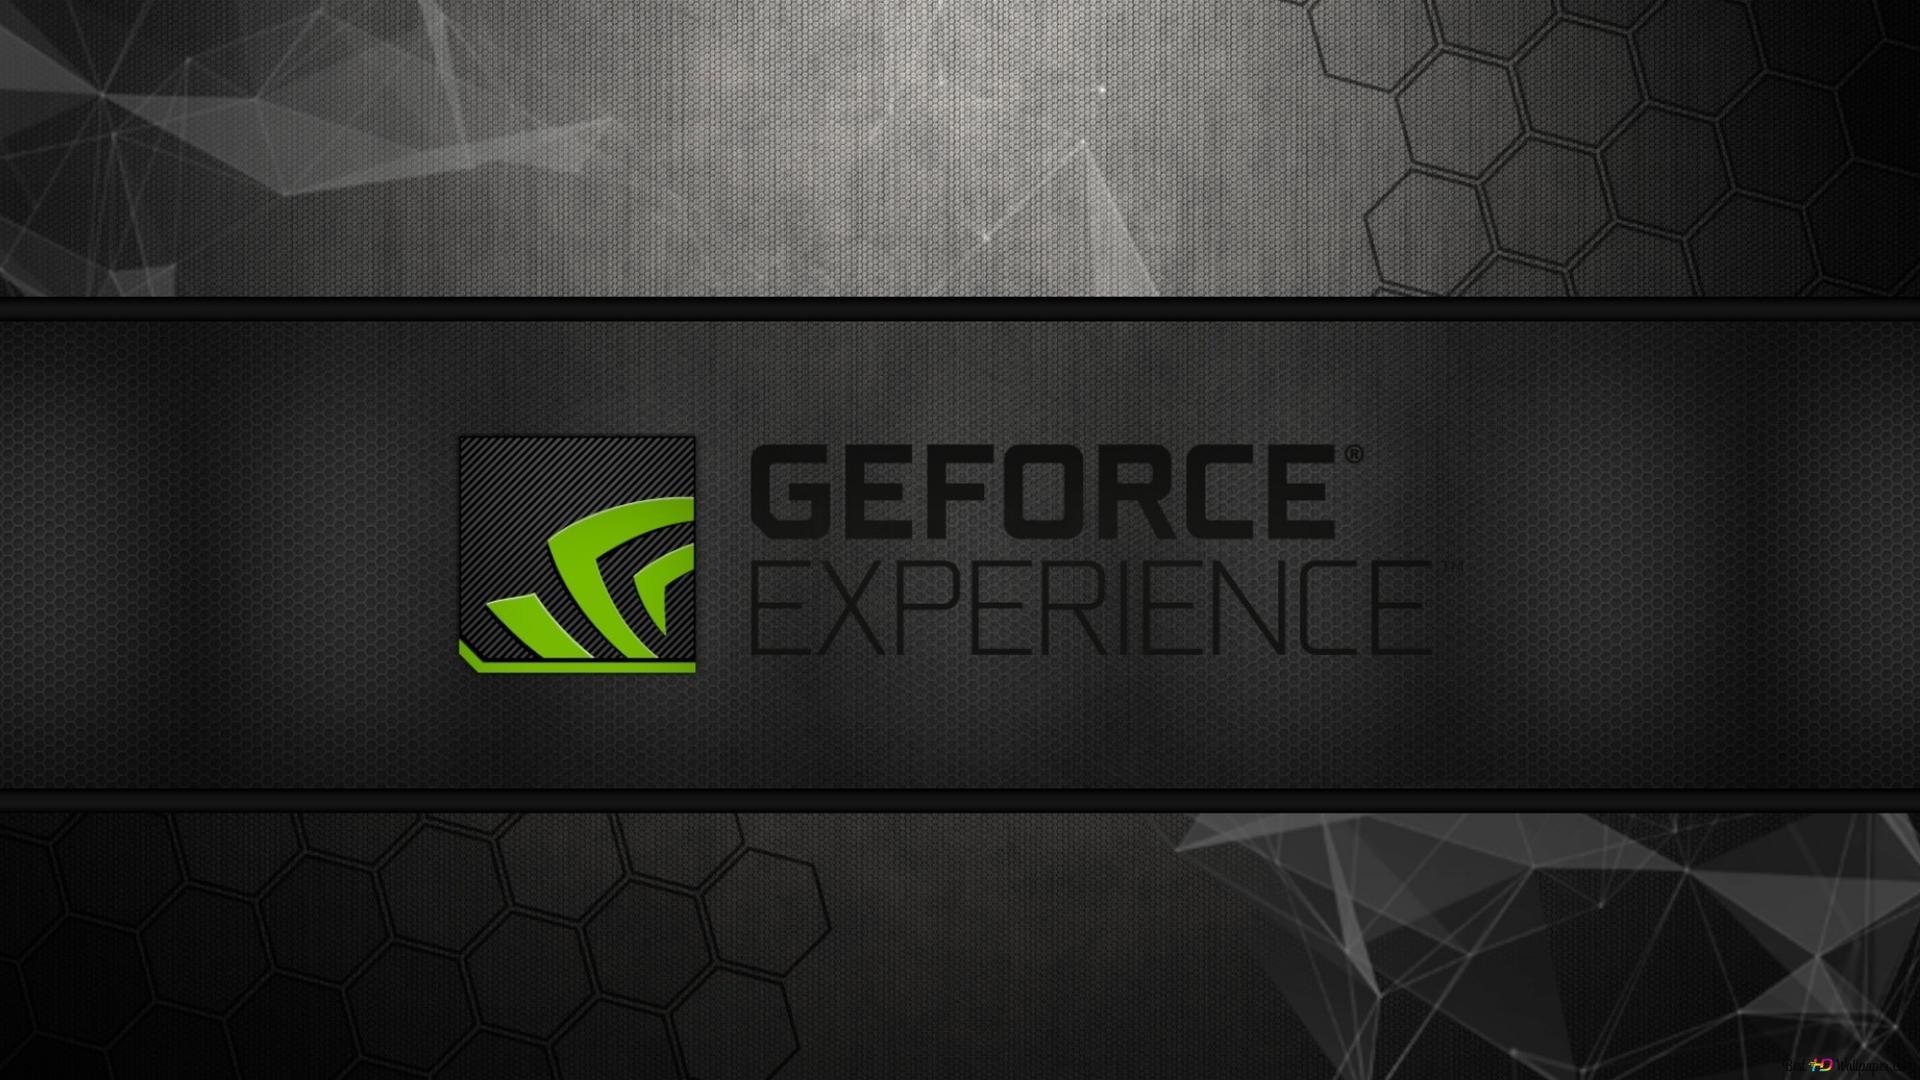 Nvidia Geforce体験 Hd壁紙のダウンロード